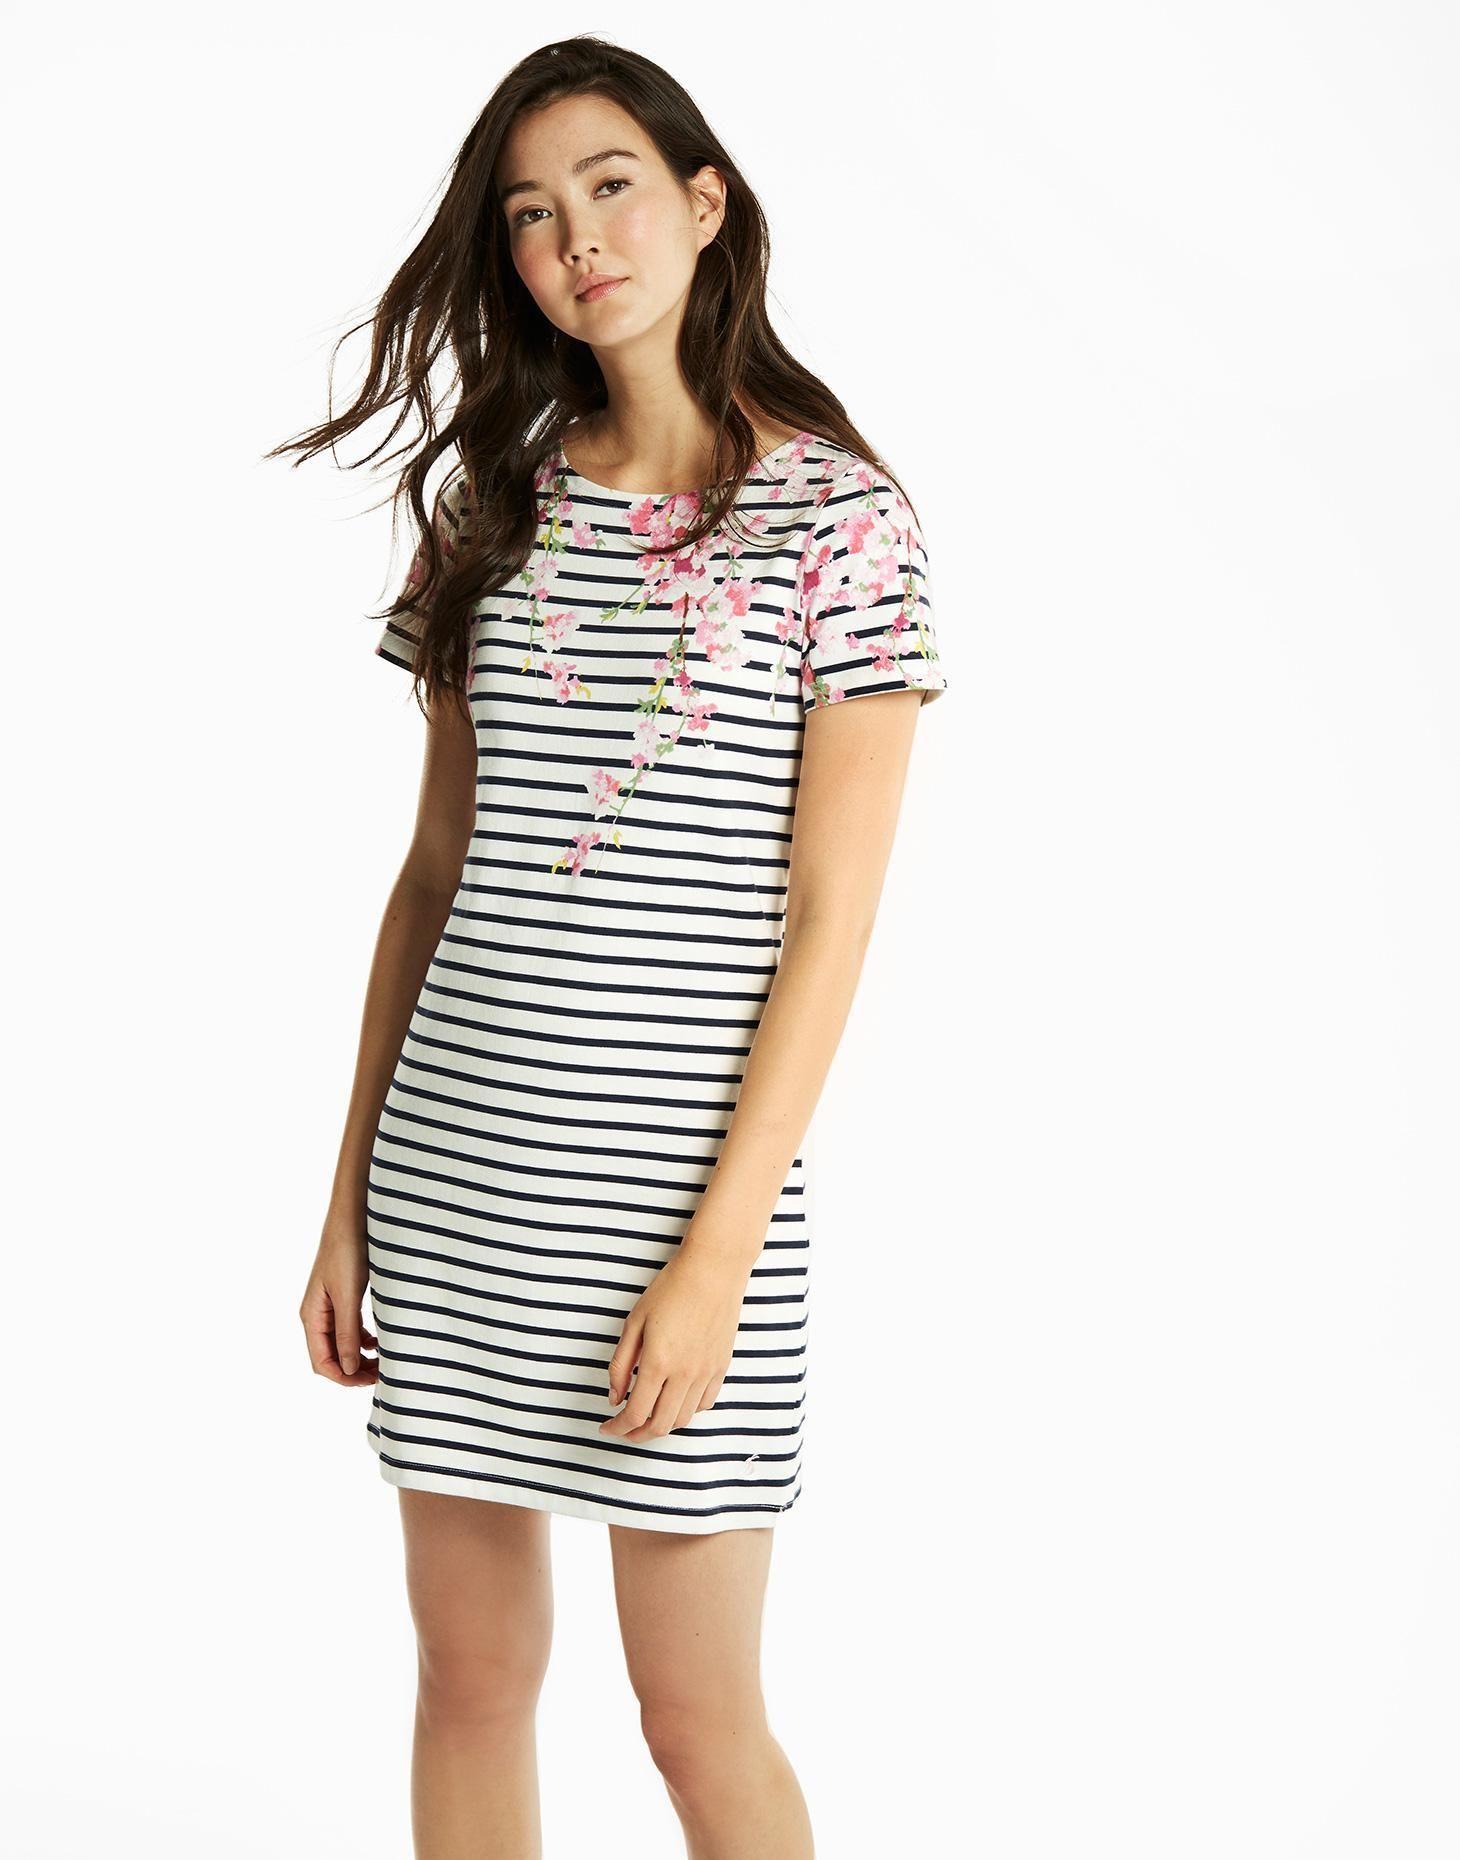 38a24cafadb Riviera printed Navy Blossom Stripe Jersey Dress